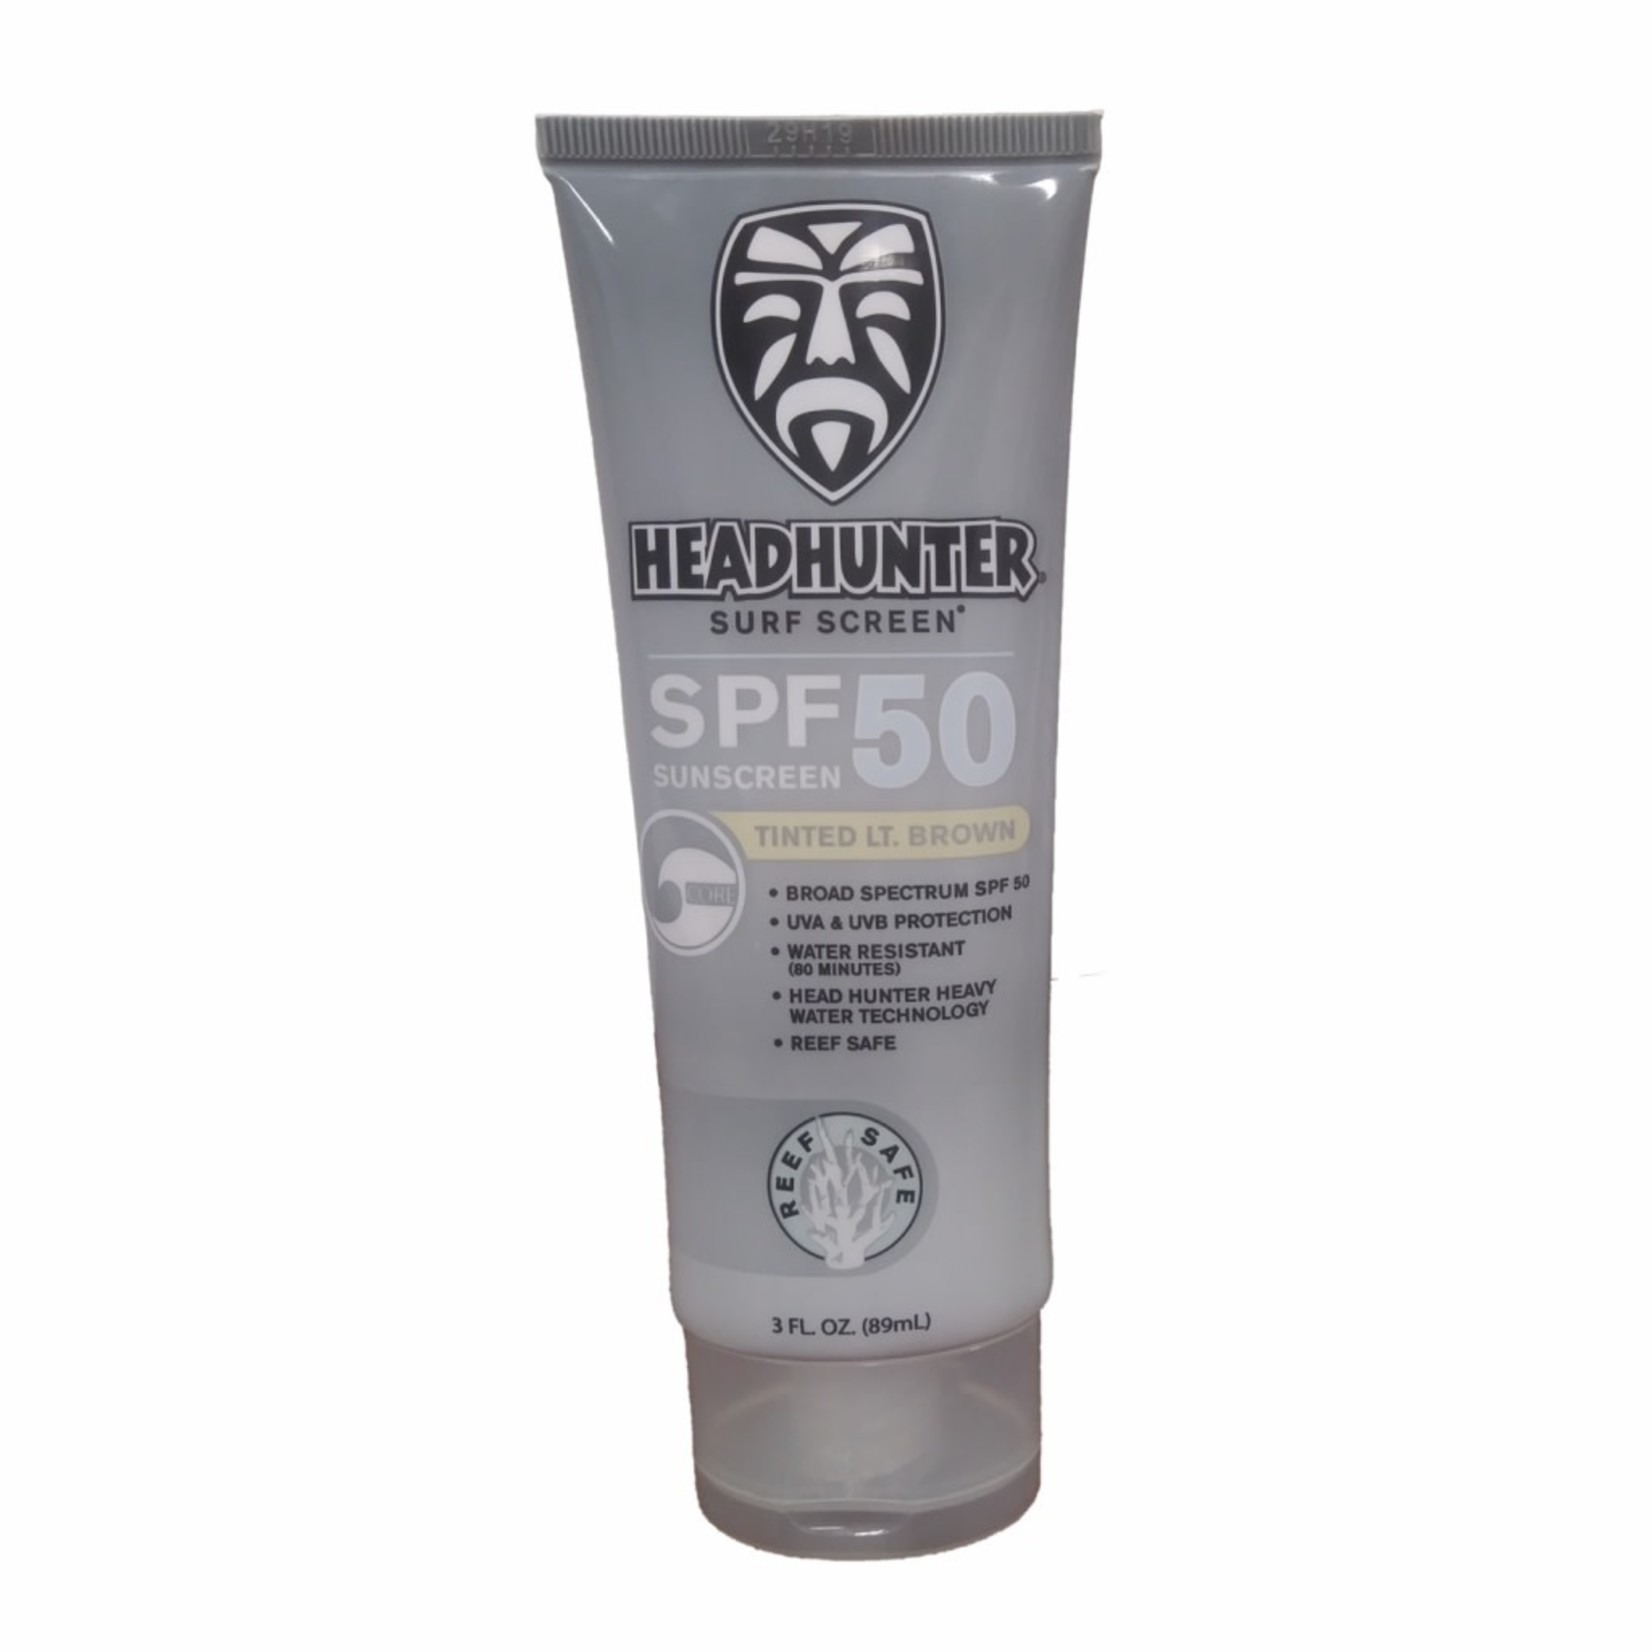 Headhunter Headhunter Surf Screen SPF 50 Lt. Brown Reef Safe Sunscreen